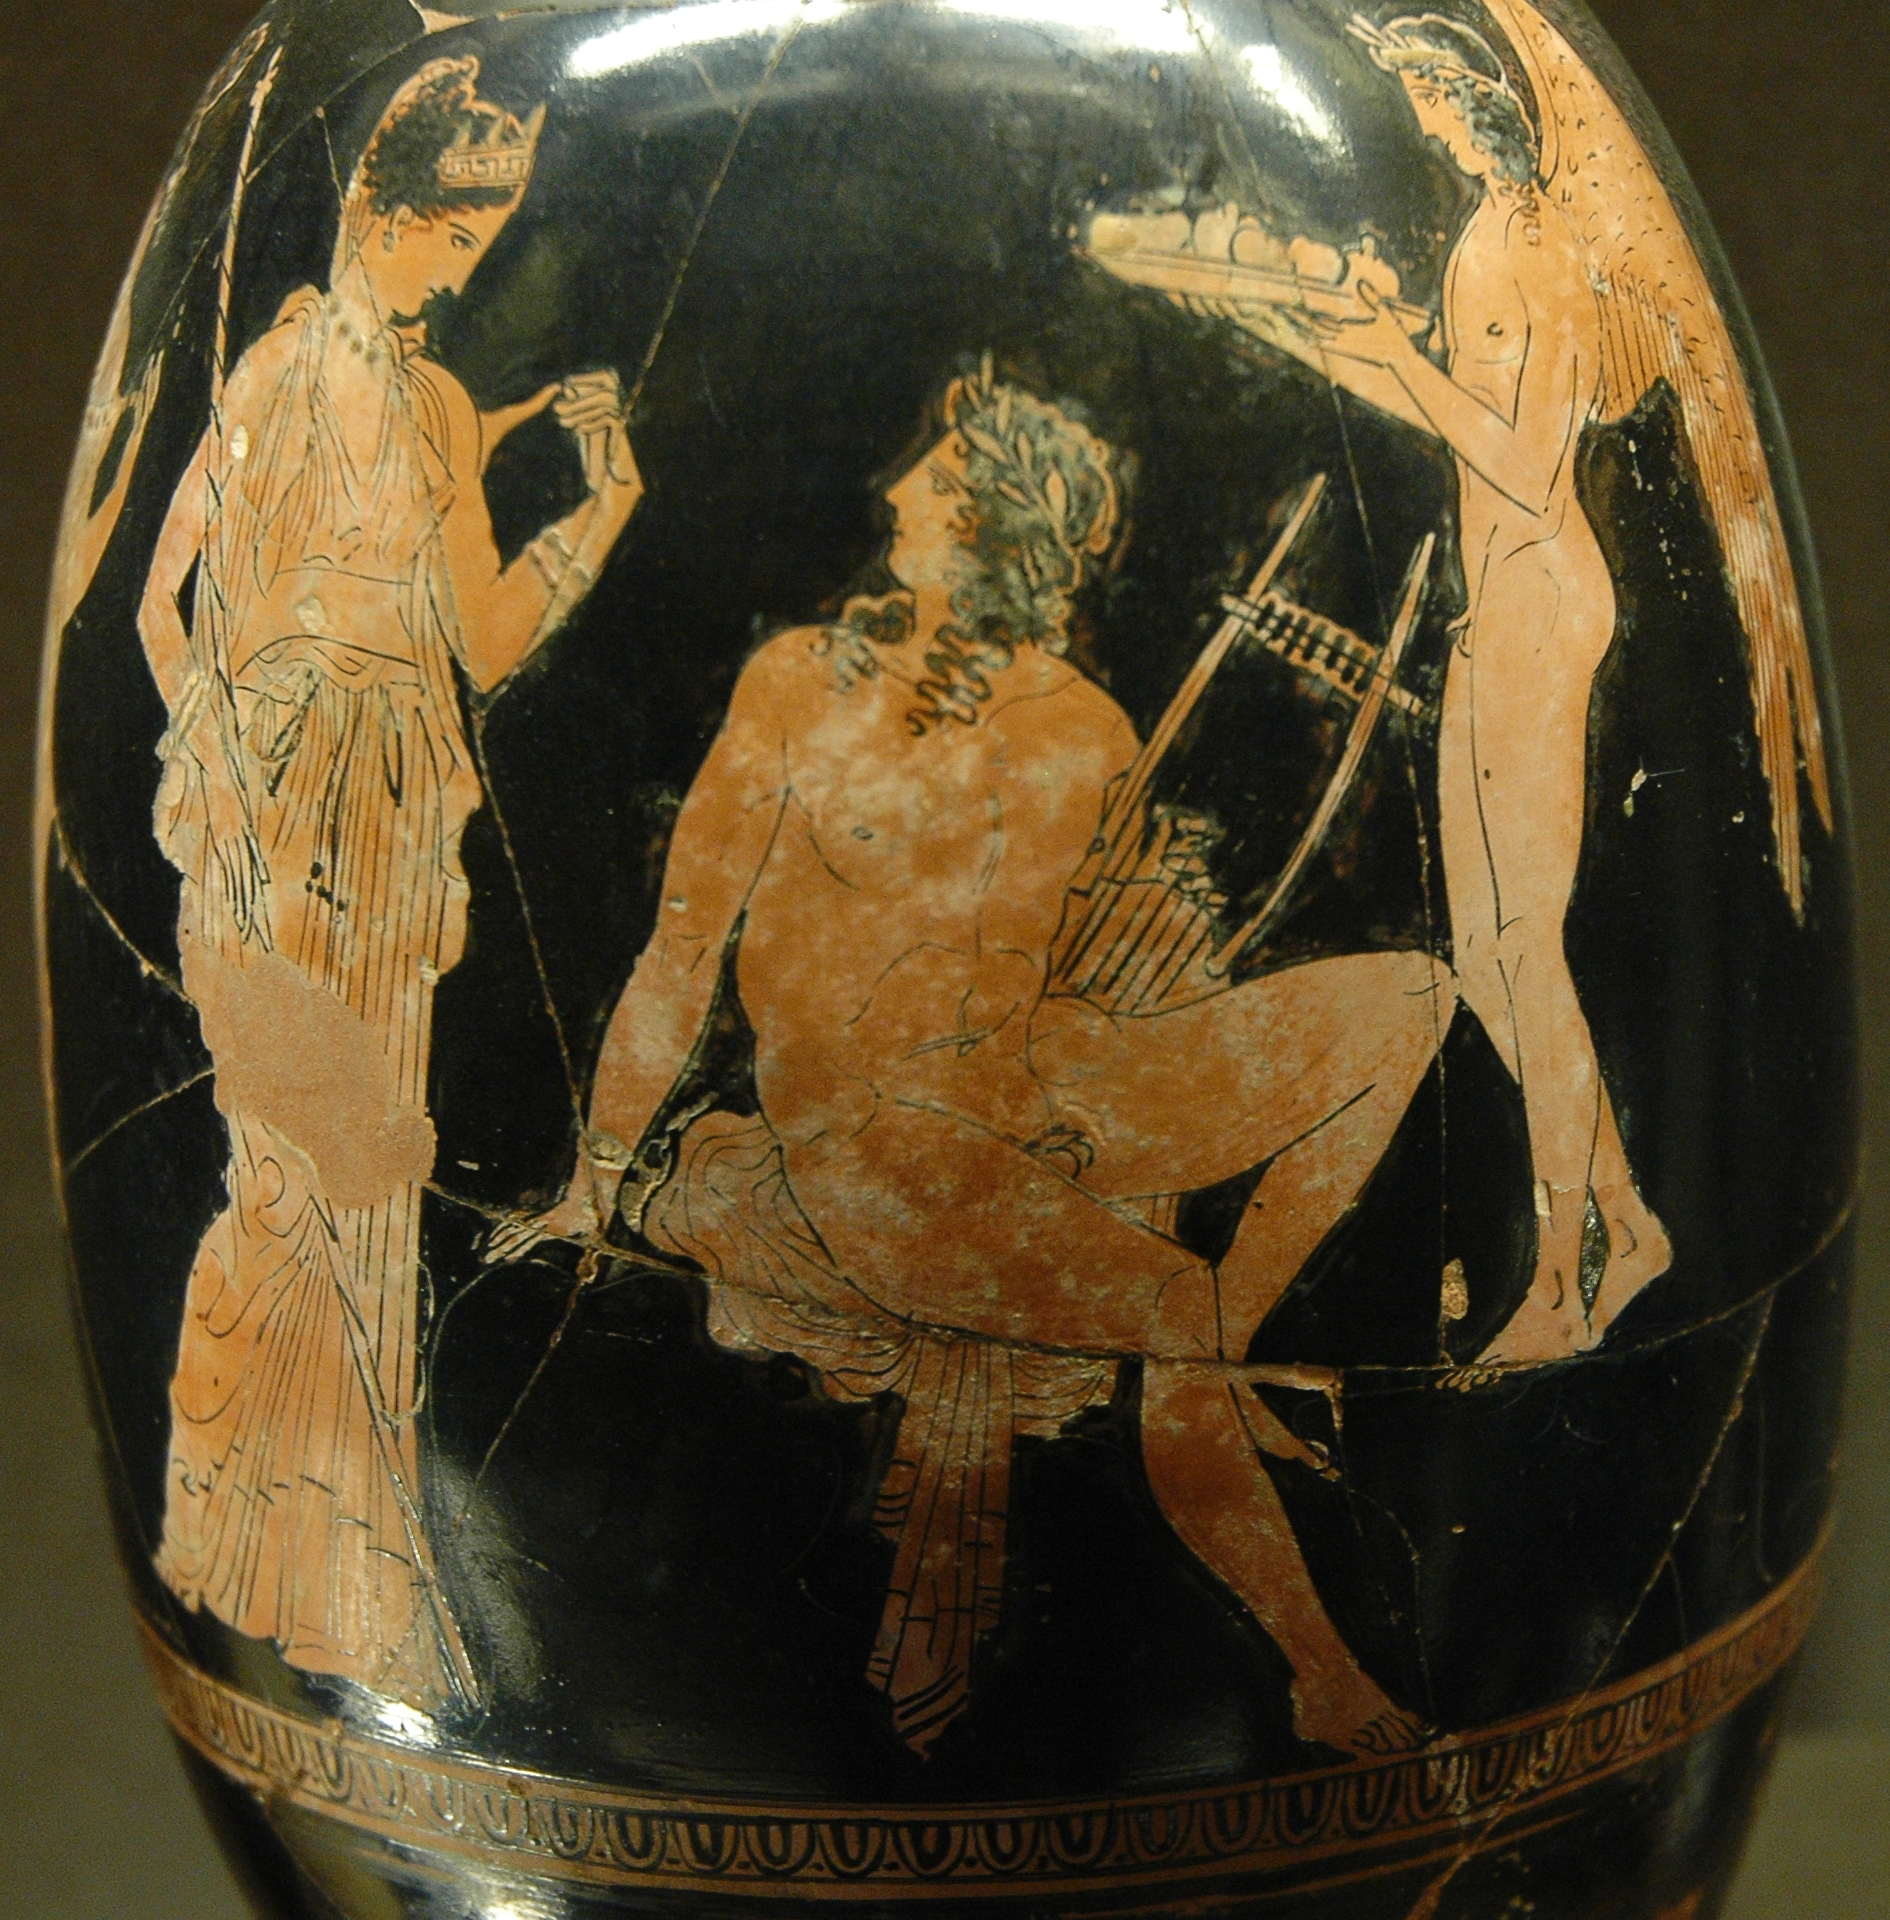 http://upload.wikimedia.org/wikipedia/commons/f/f6/Aphrodite_Adonis_Louvre_MNB2109.jpg